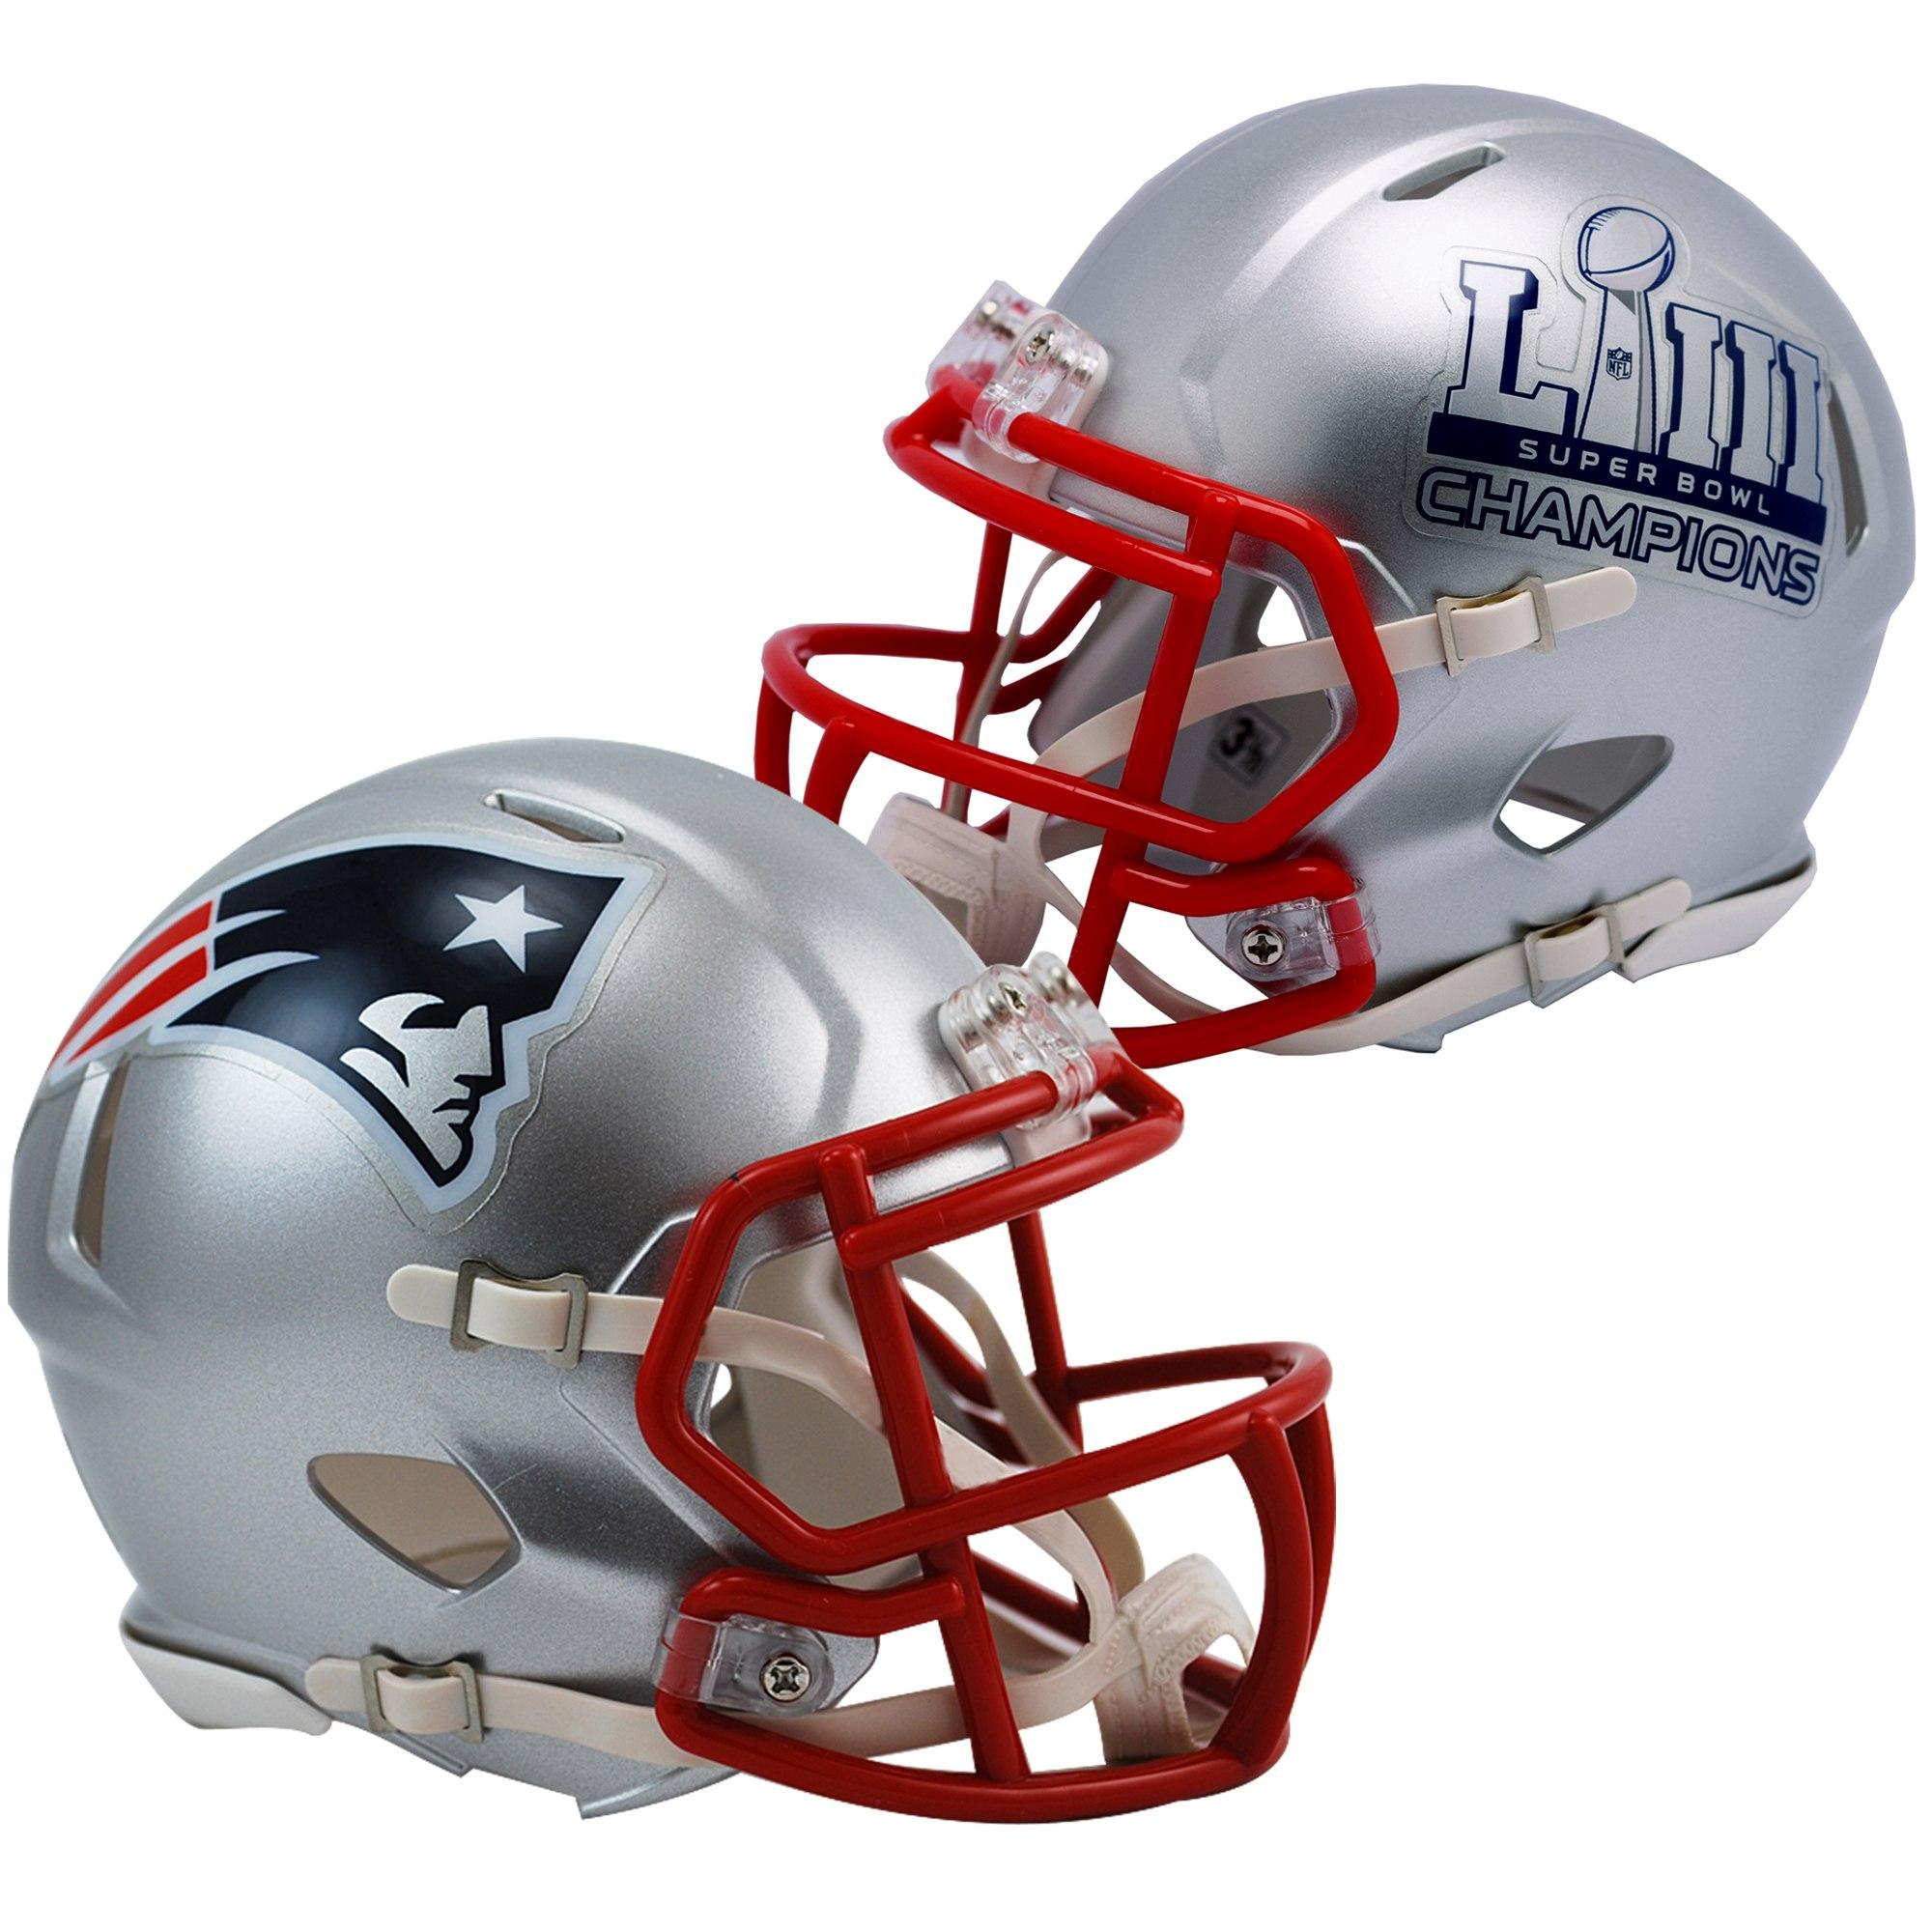 New England Patriots Super Bowl LIII Champions Mini Bobbleheads 4-pack Set